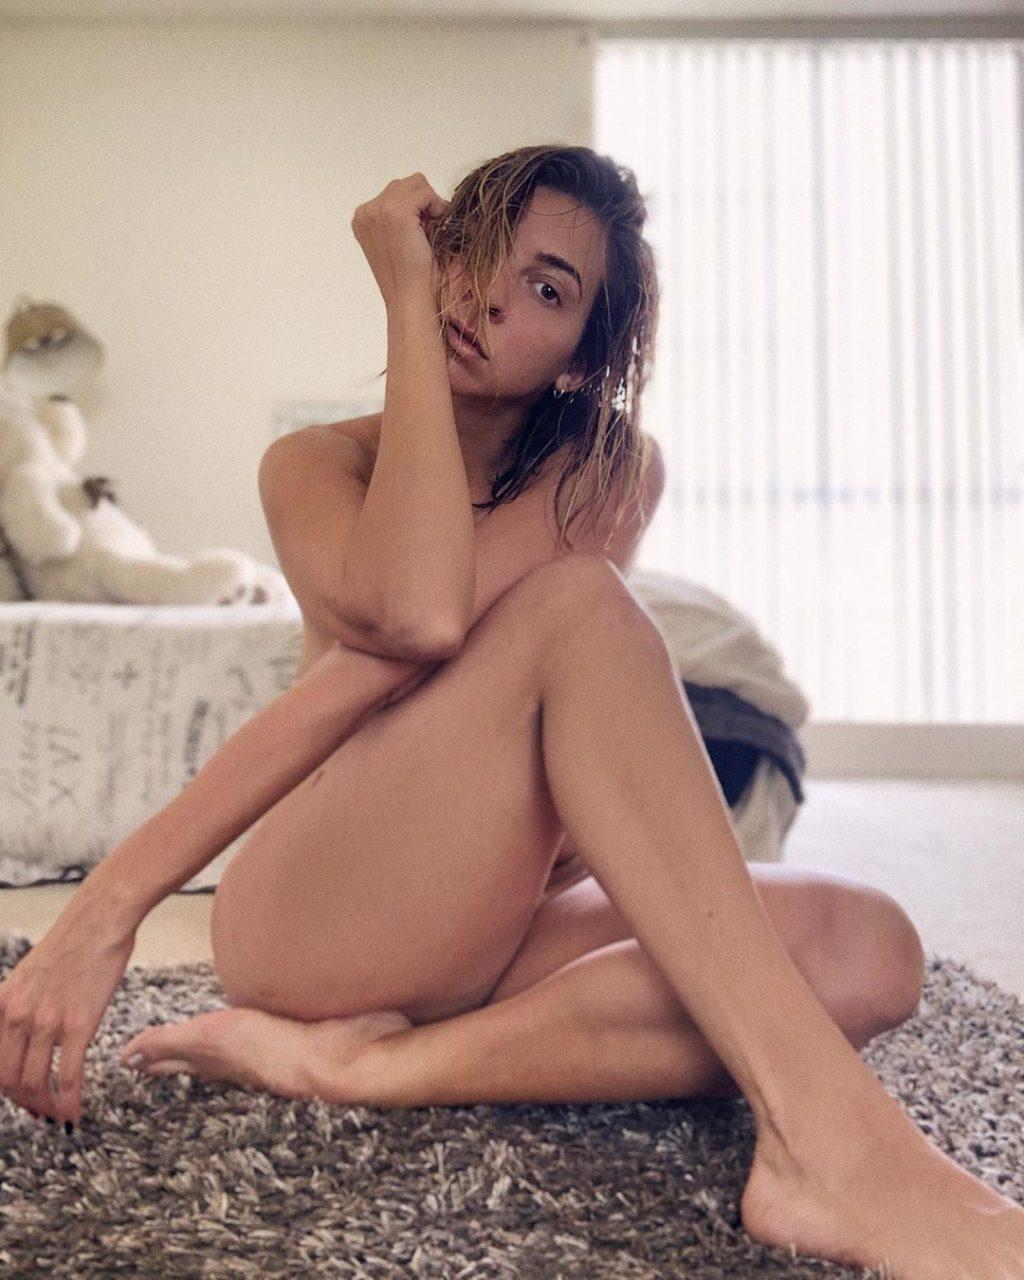 Alexandra Doyle Porn gabbie hanna sexy (3 photos)   new celebrity nudes